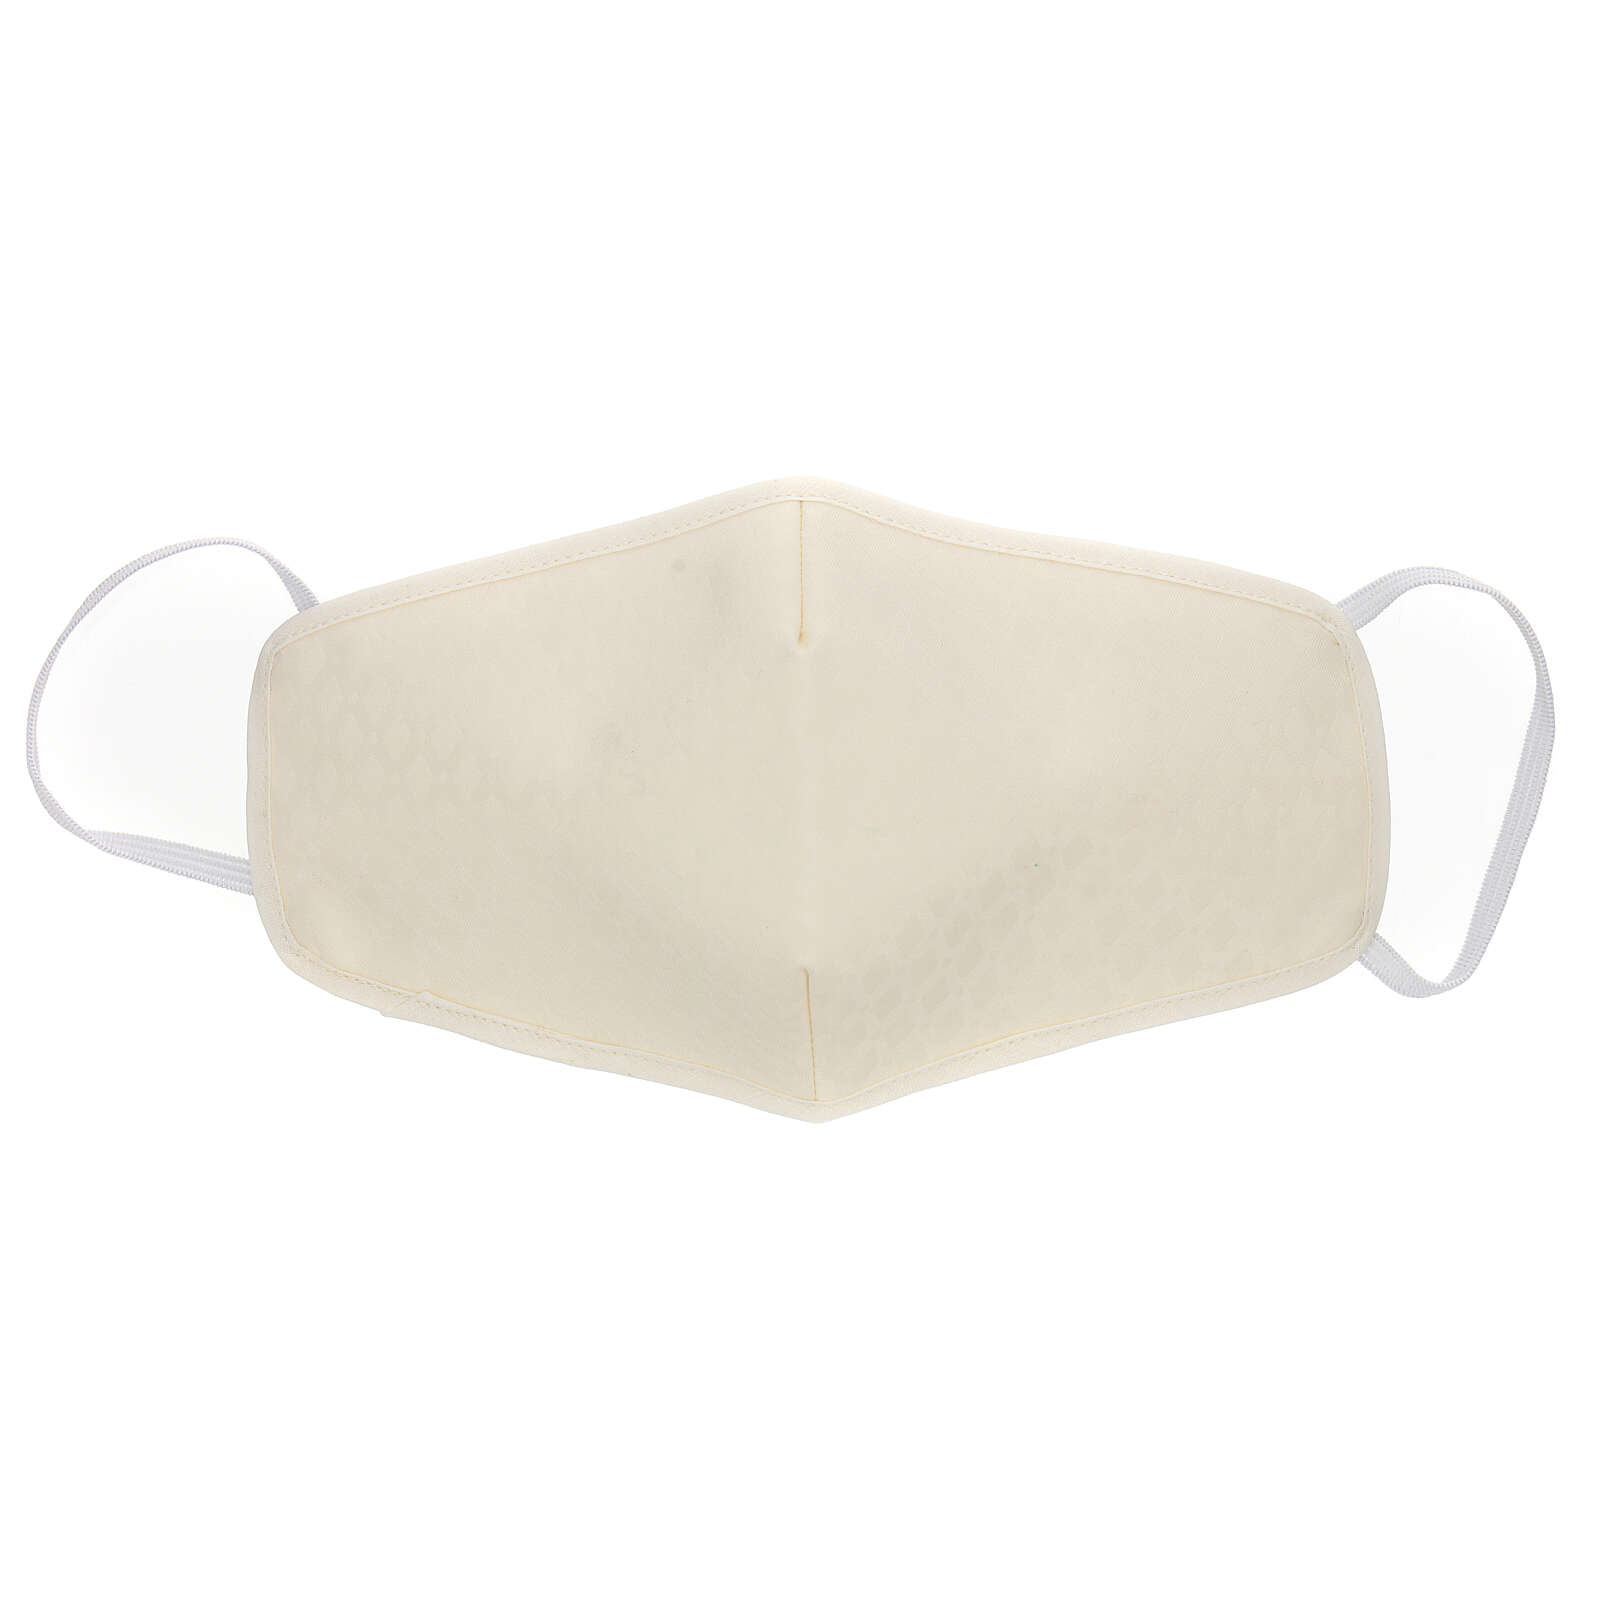 Mascarilla de tela reutilizable marfil 3